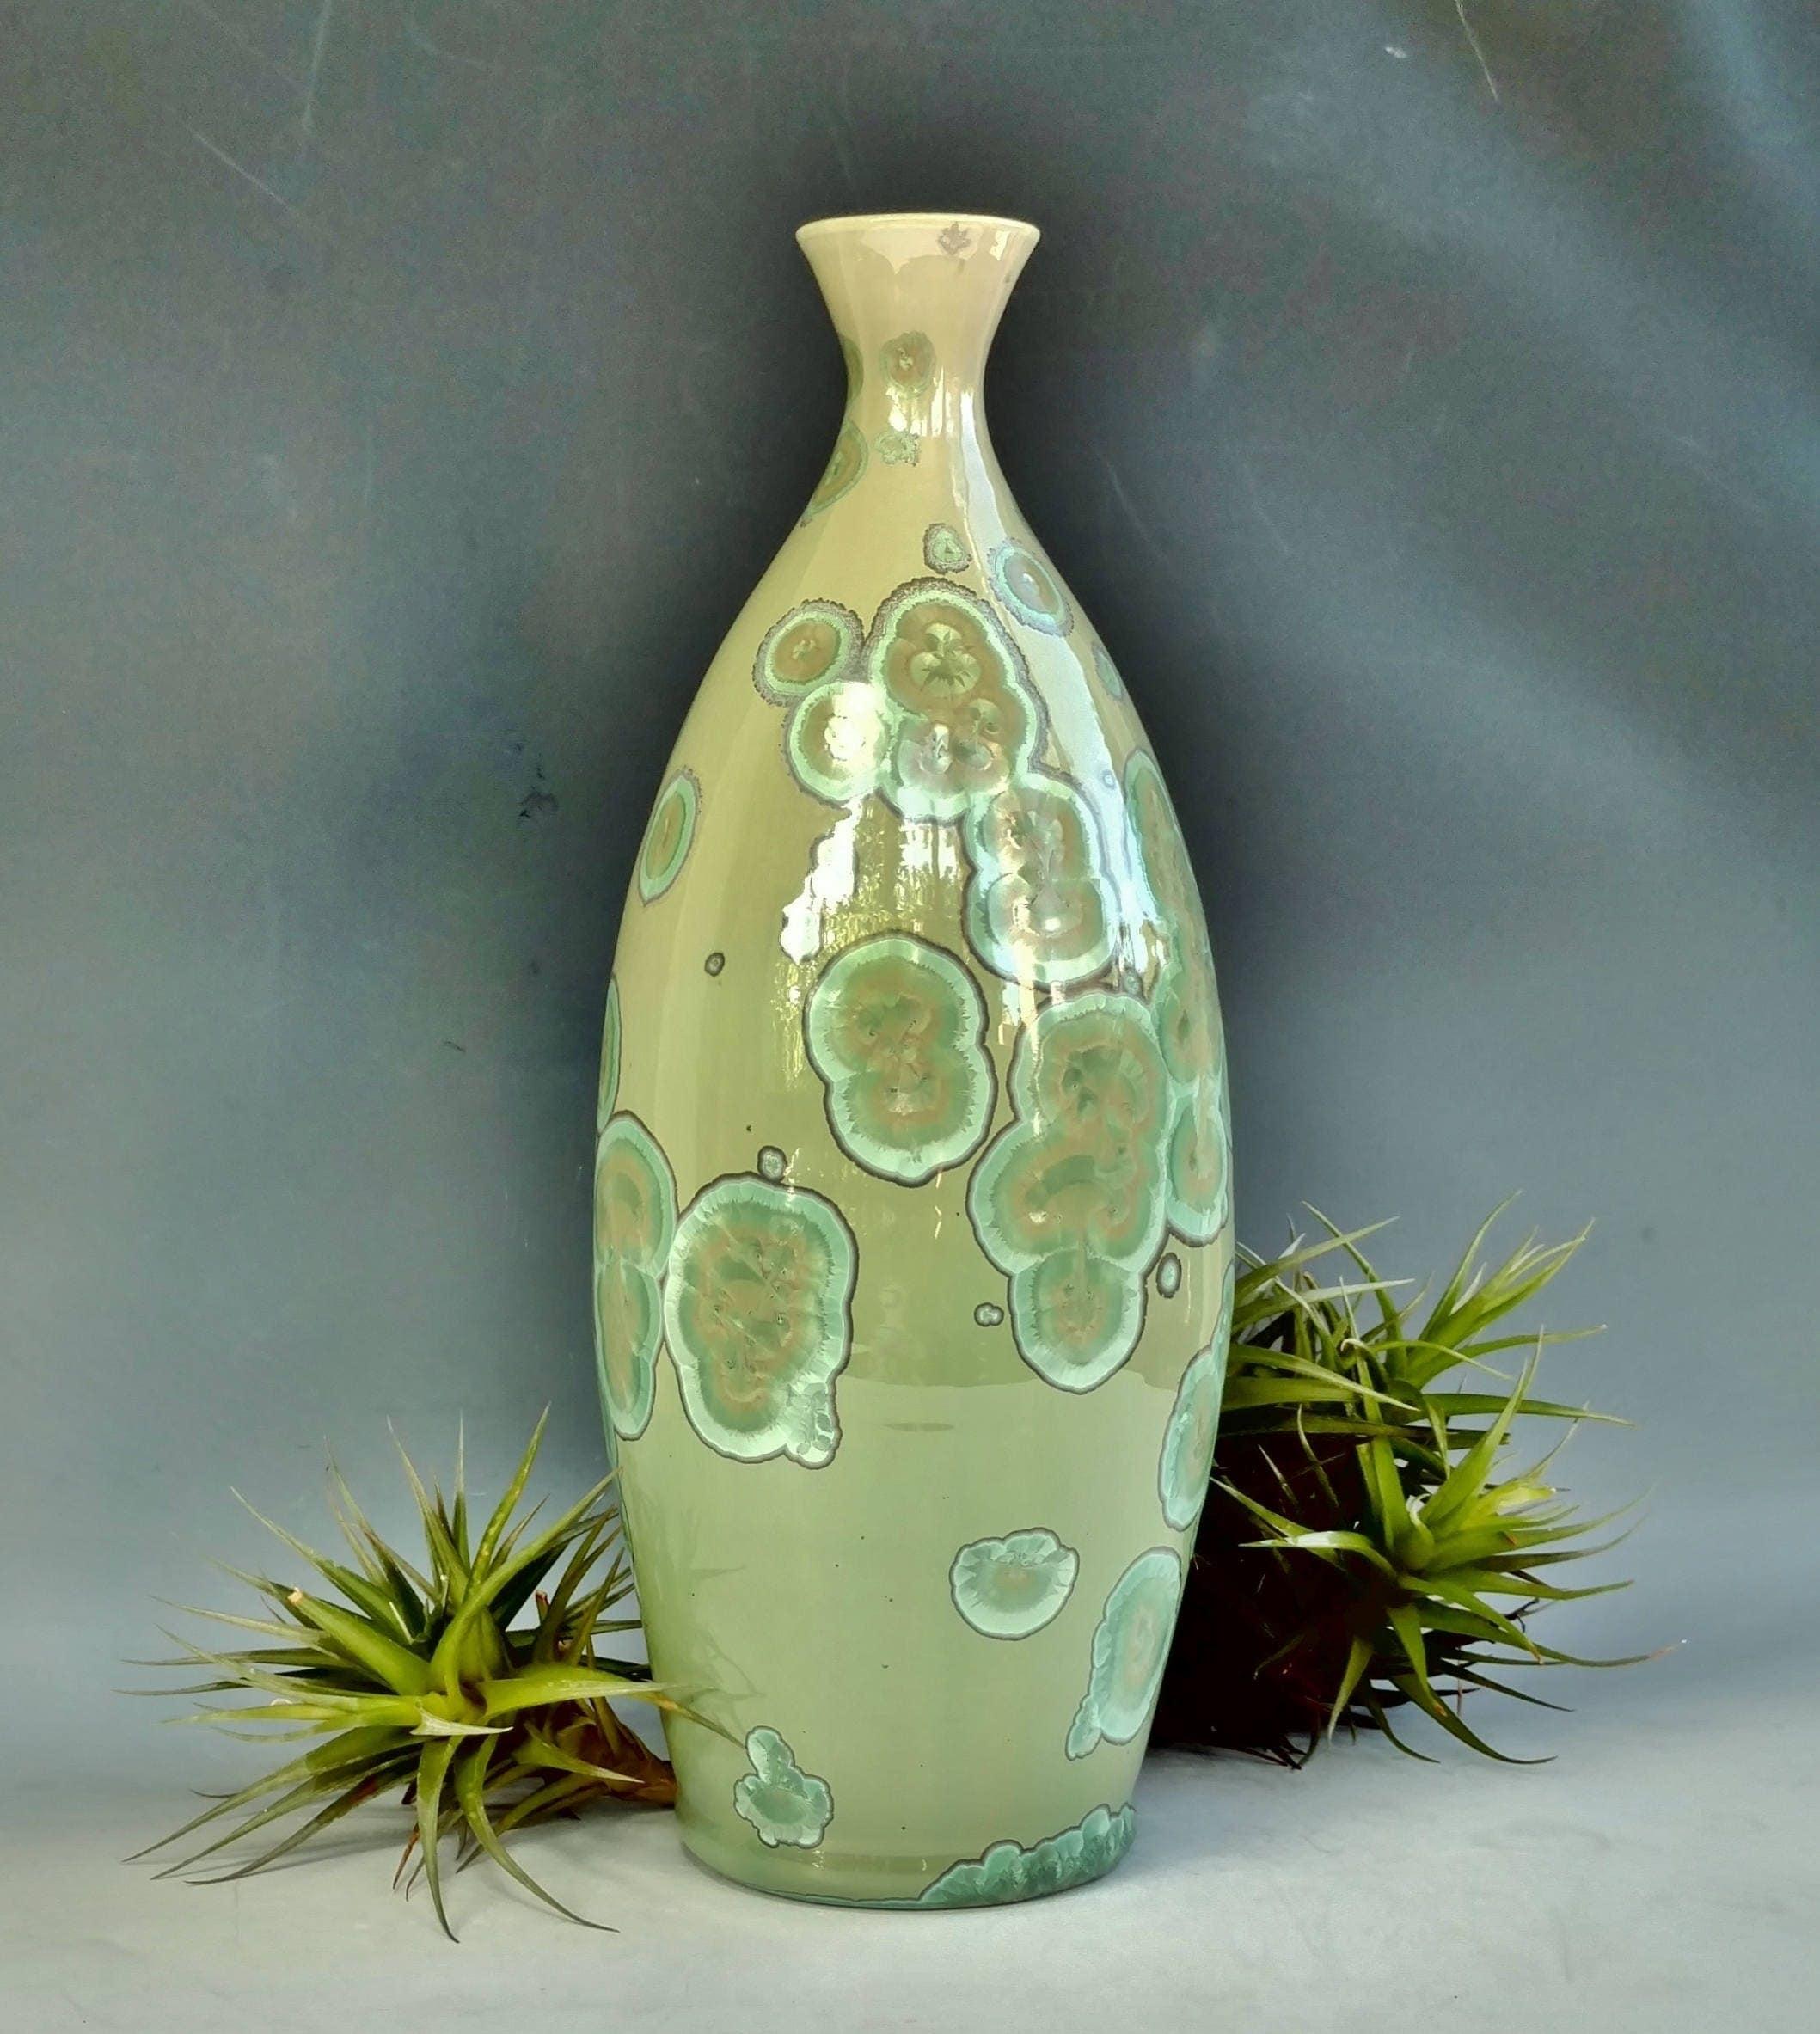 Tall ceramic vase crystalline glaze pottery large green bottle tall ceramic vase crystalline glaze pottery large green bottle bedroom bathroom kitchen home office decor handmade gift 12 tall reviewsmspy